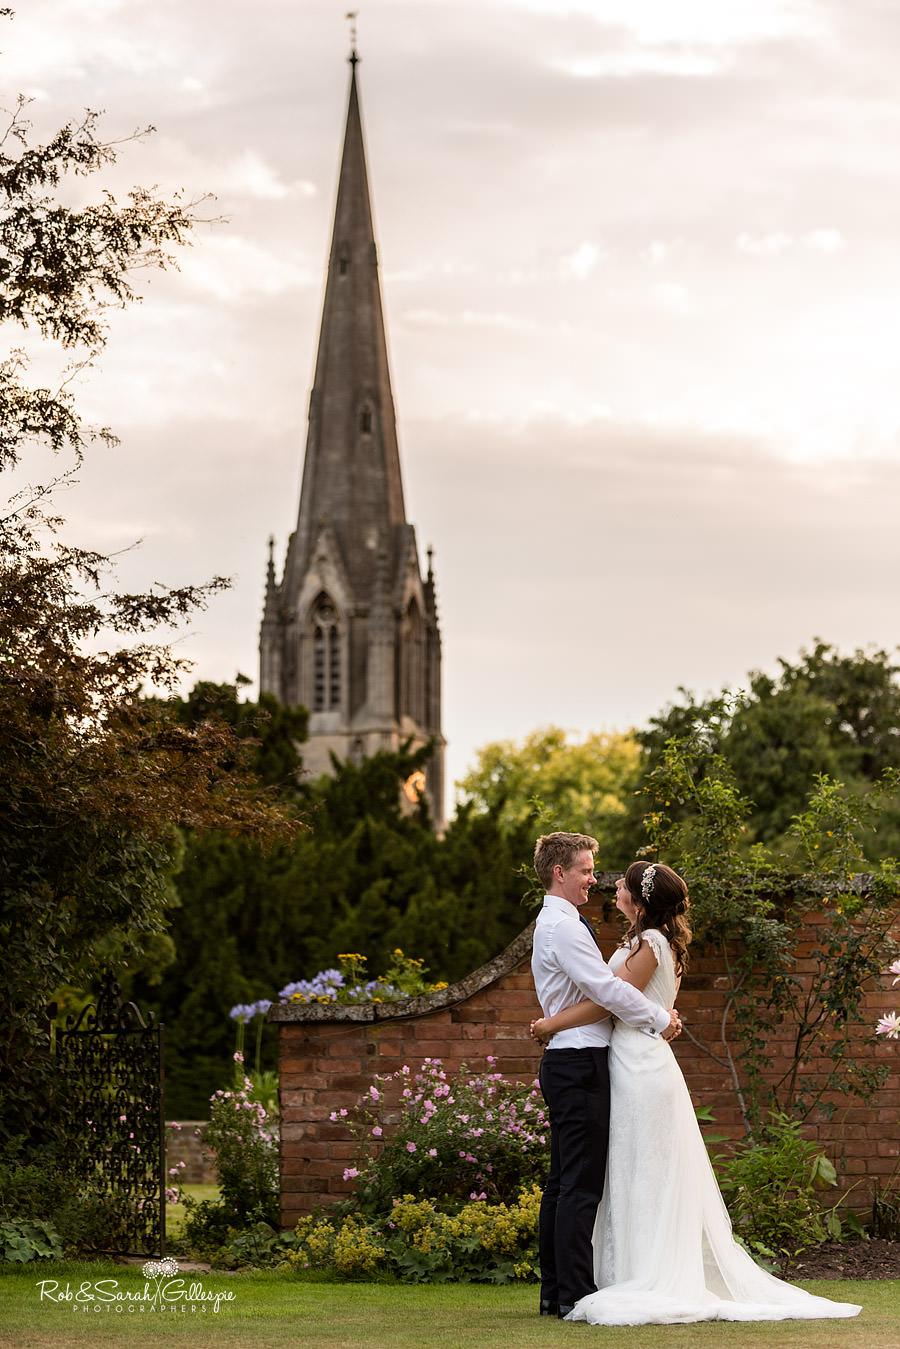 sherbourne-park-warwickshire-wedding-photograph-182